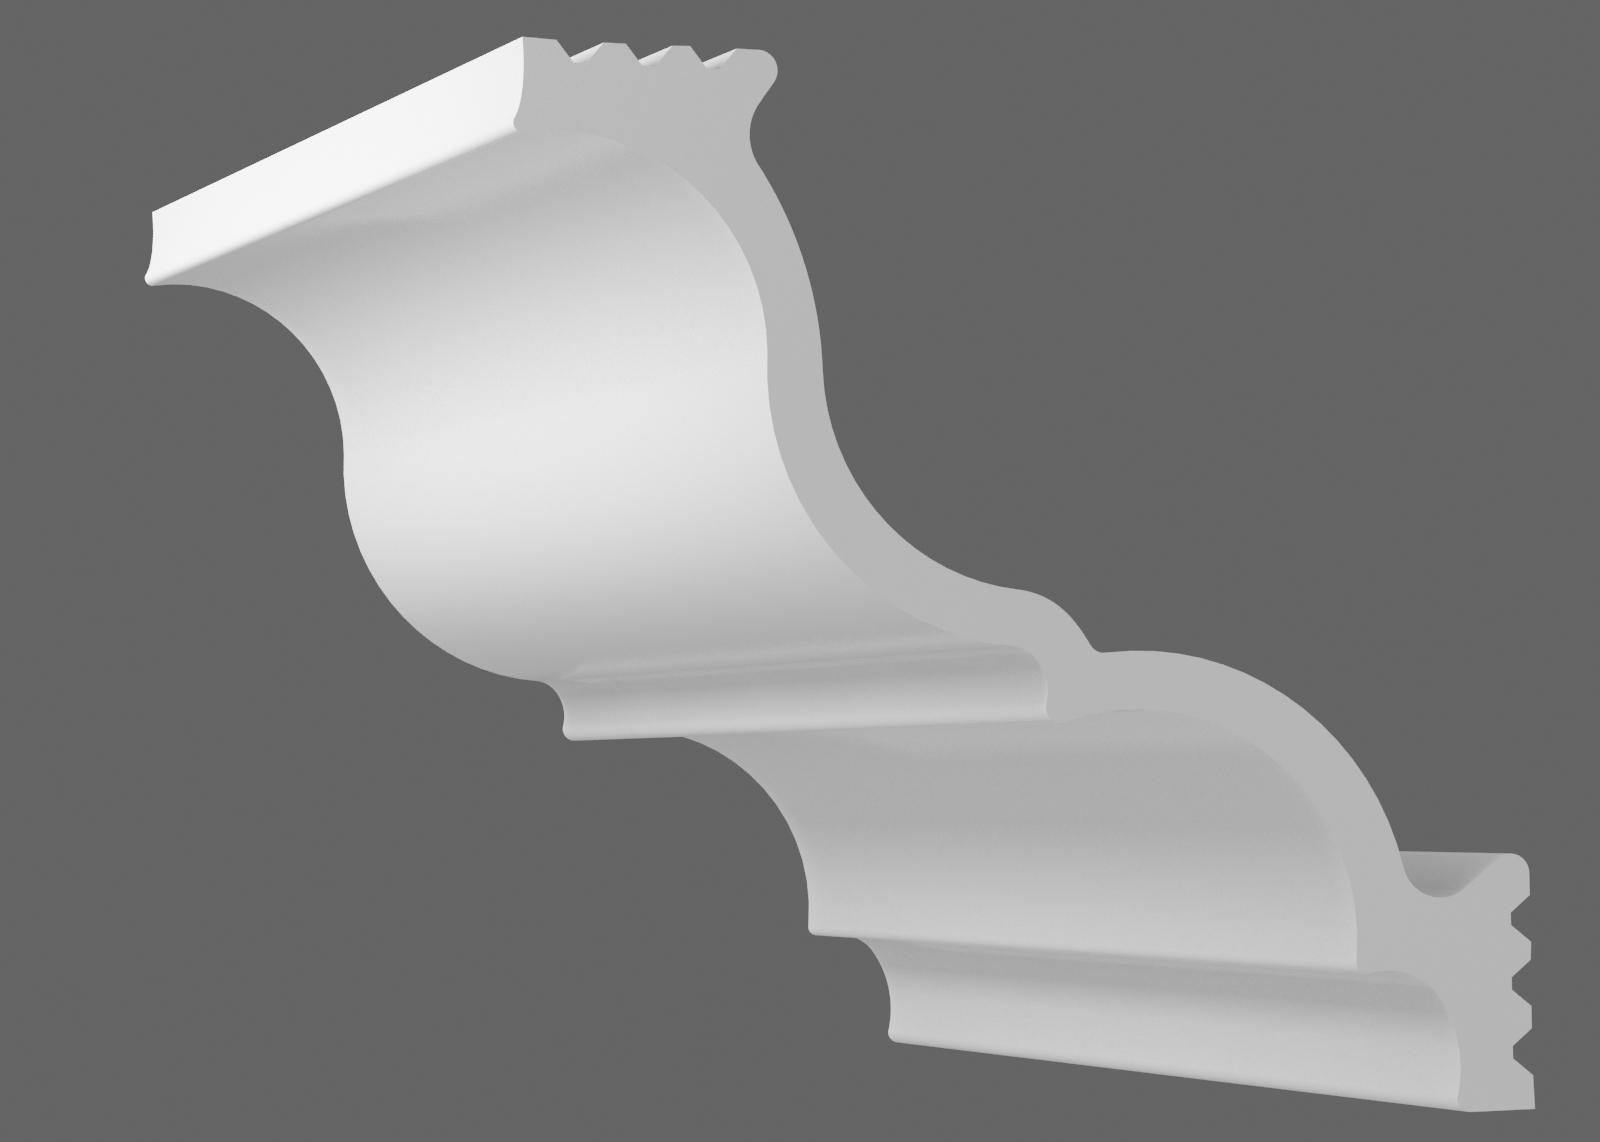 Потолочный плинтус S-150 (Размер:105х105мм)